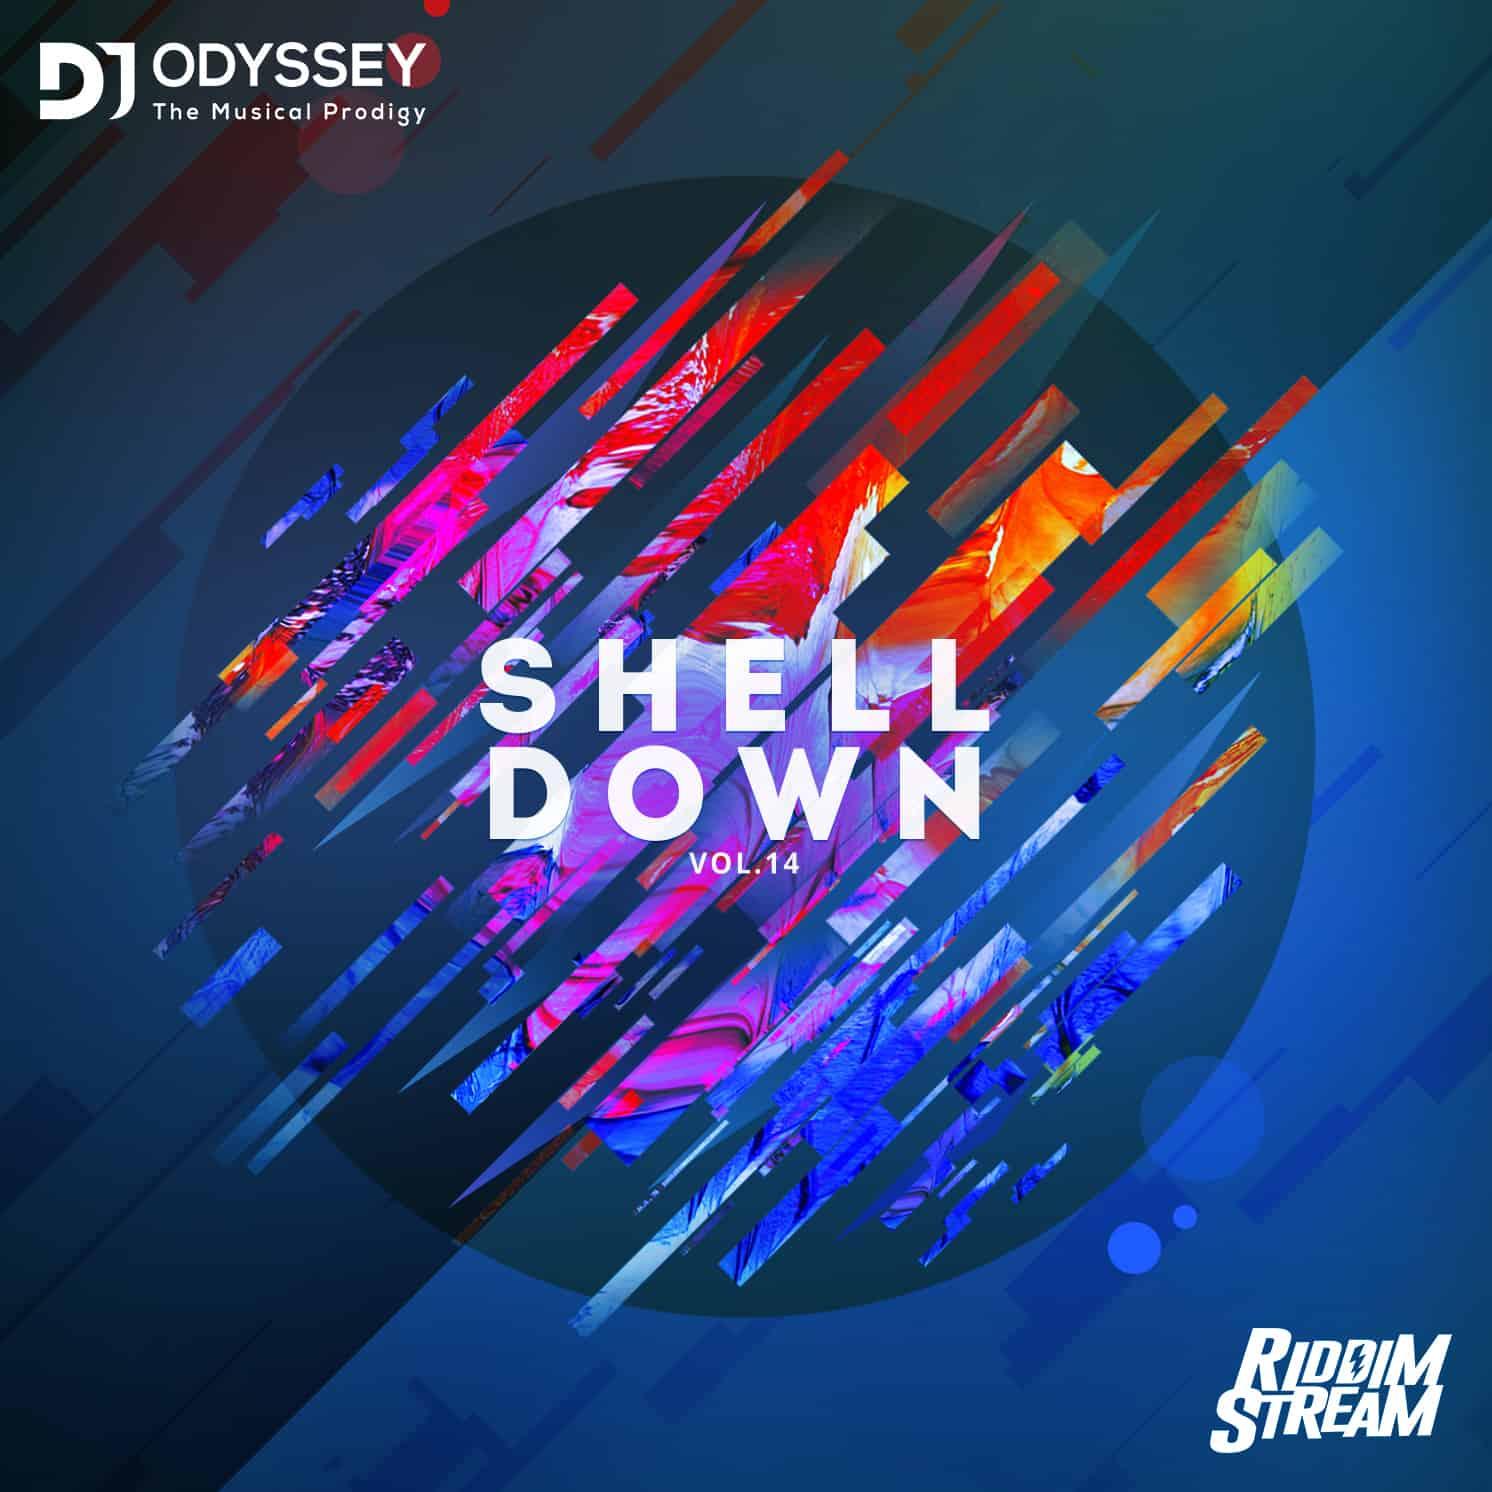 DJ Odyssey - Shell Down Vol. 14